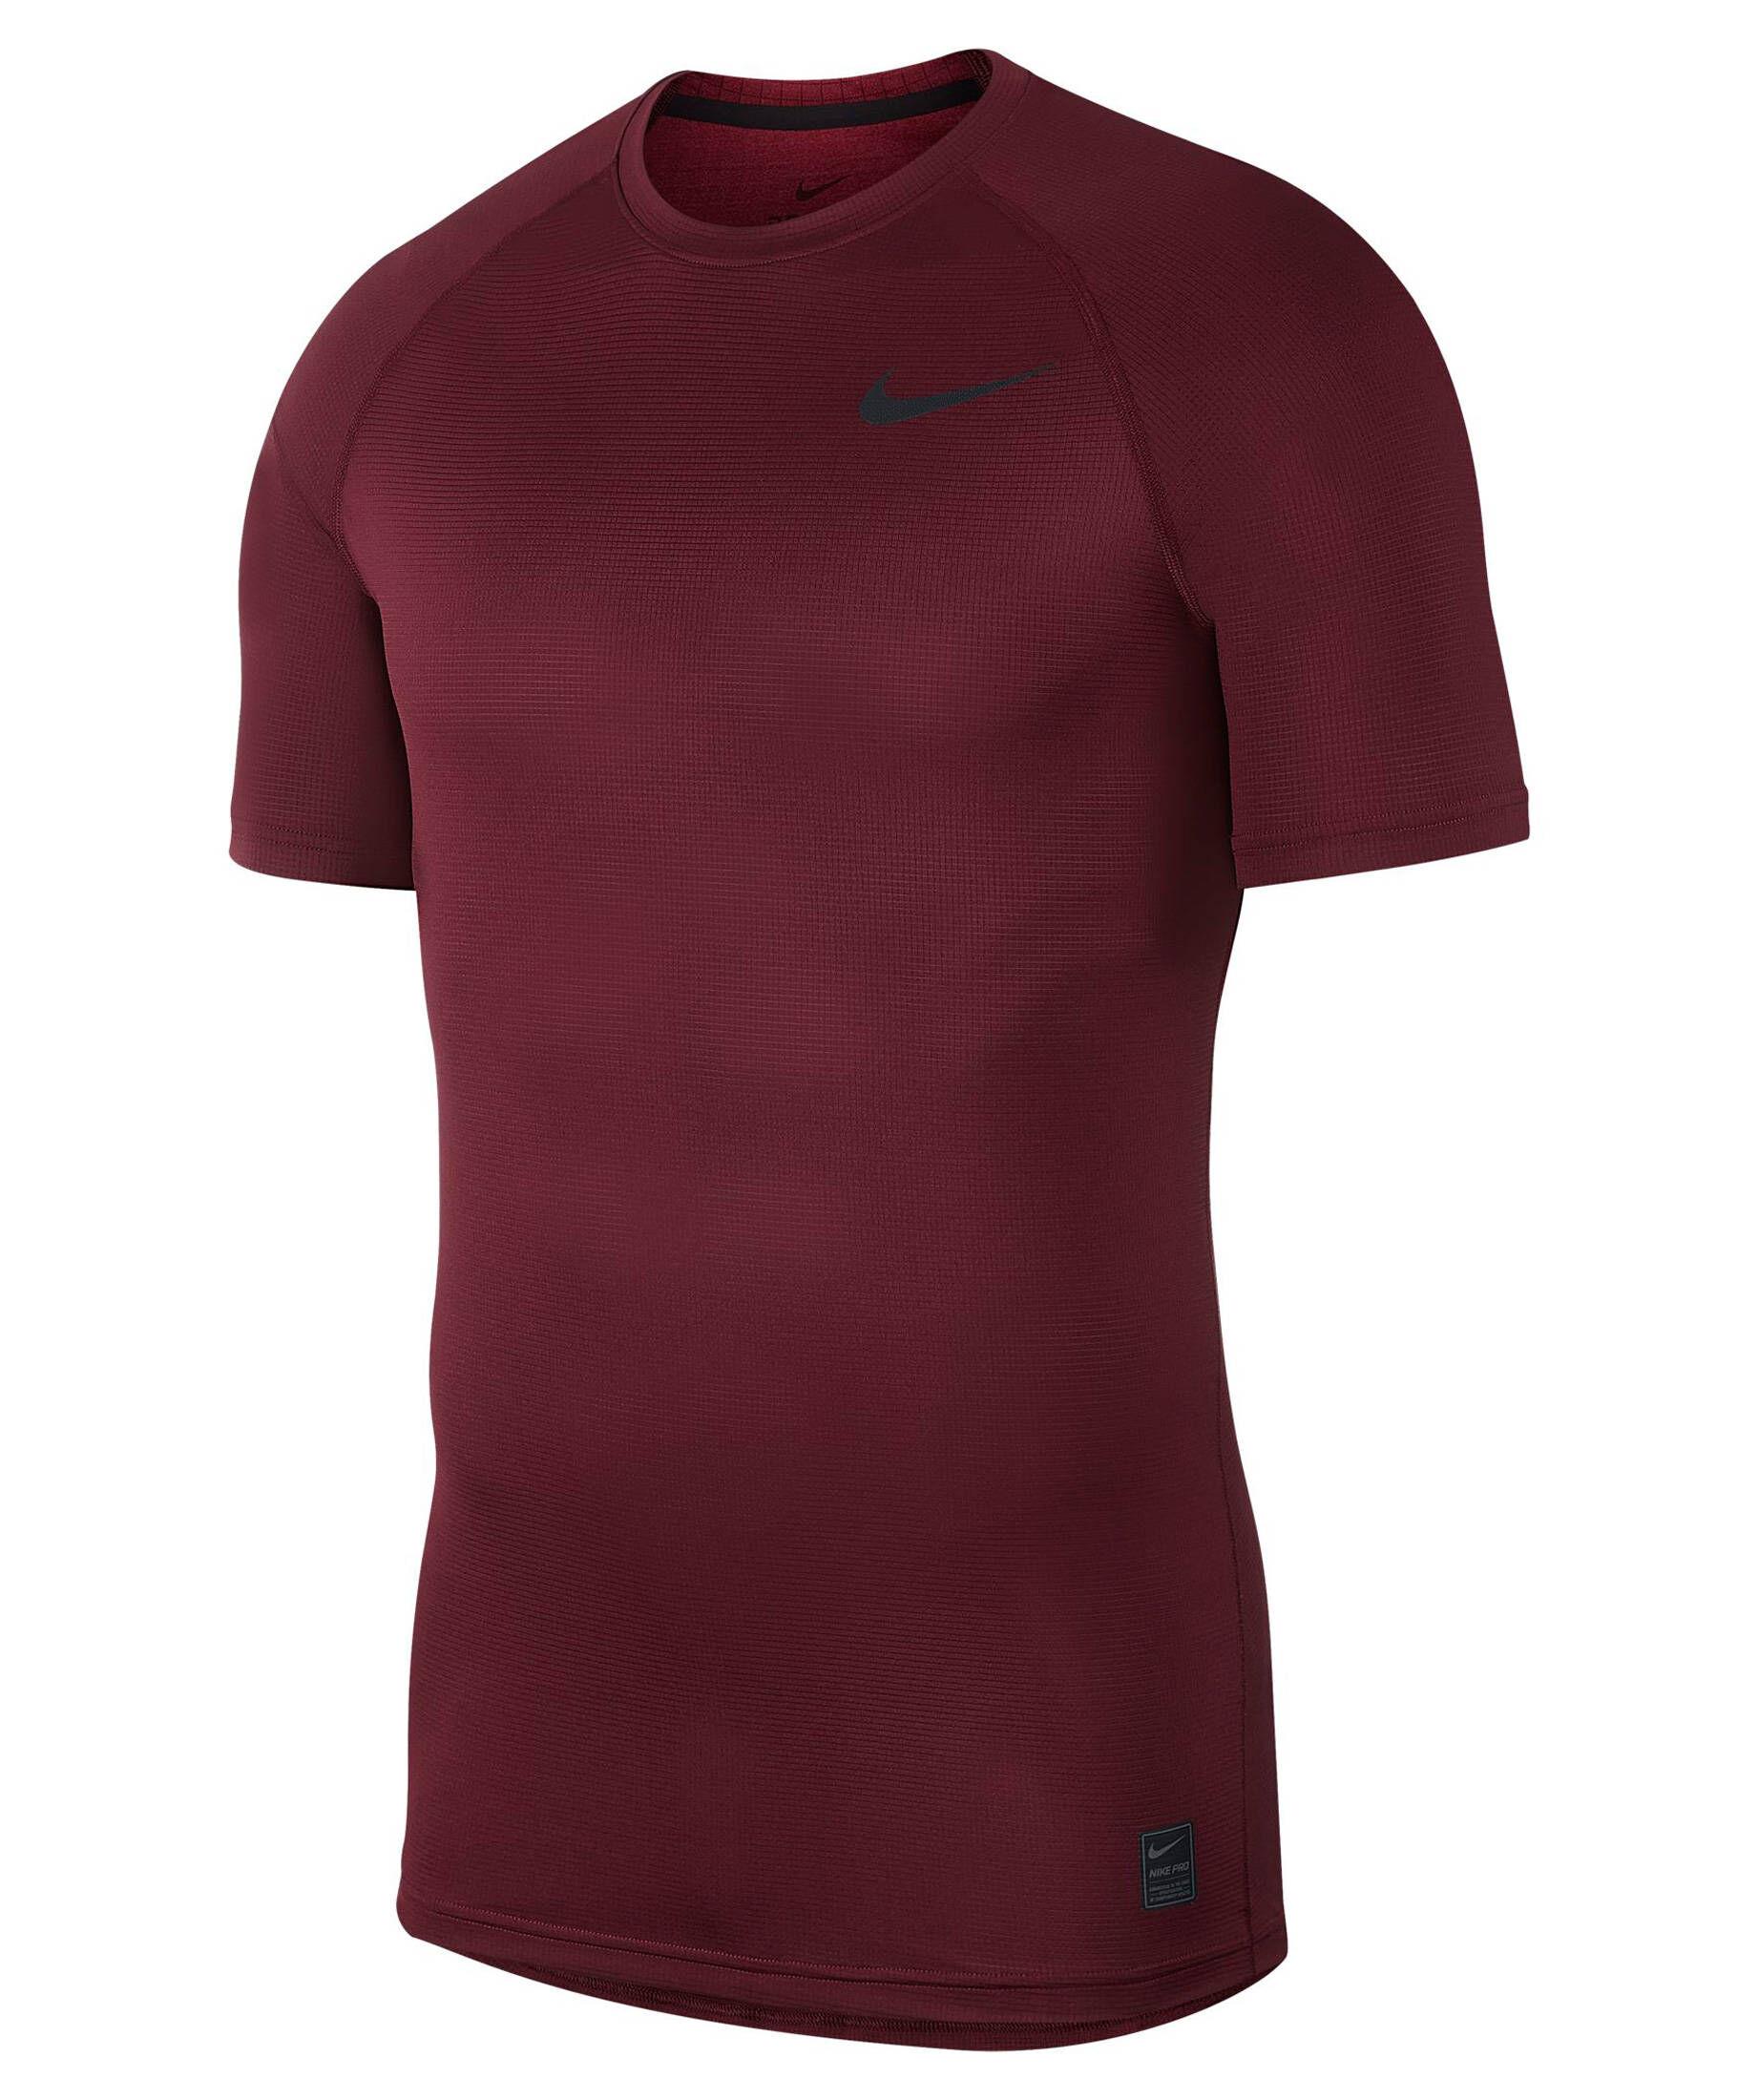 Shirts engelhorn sports